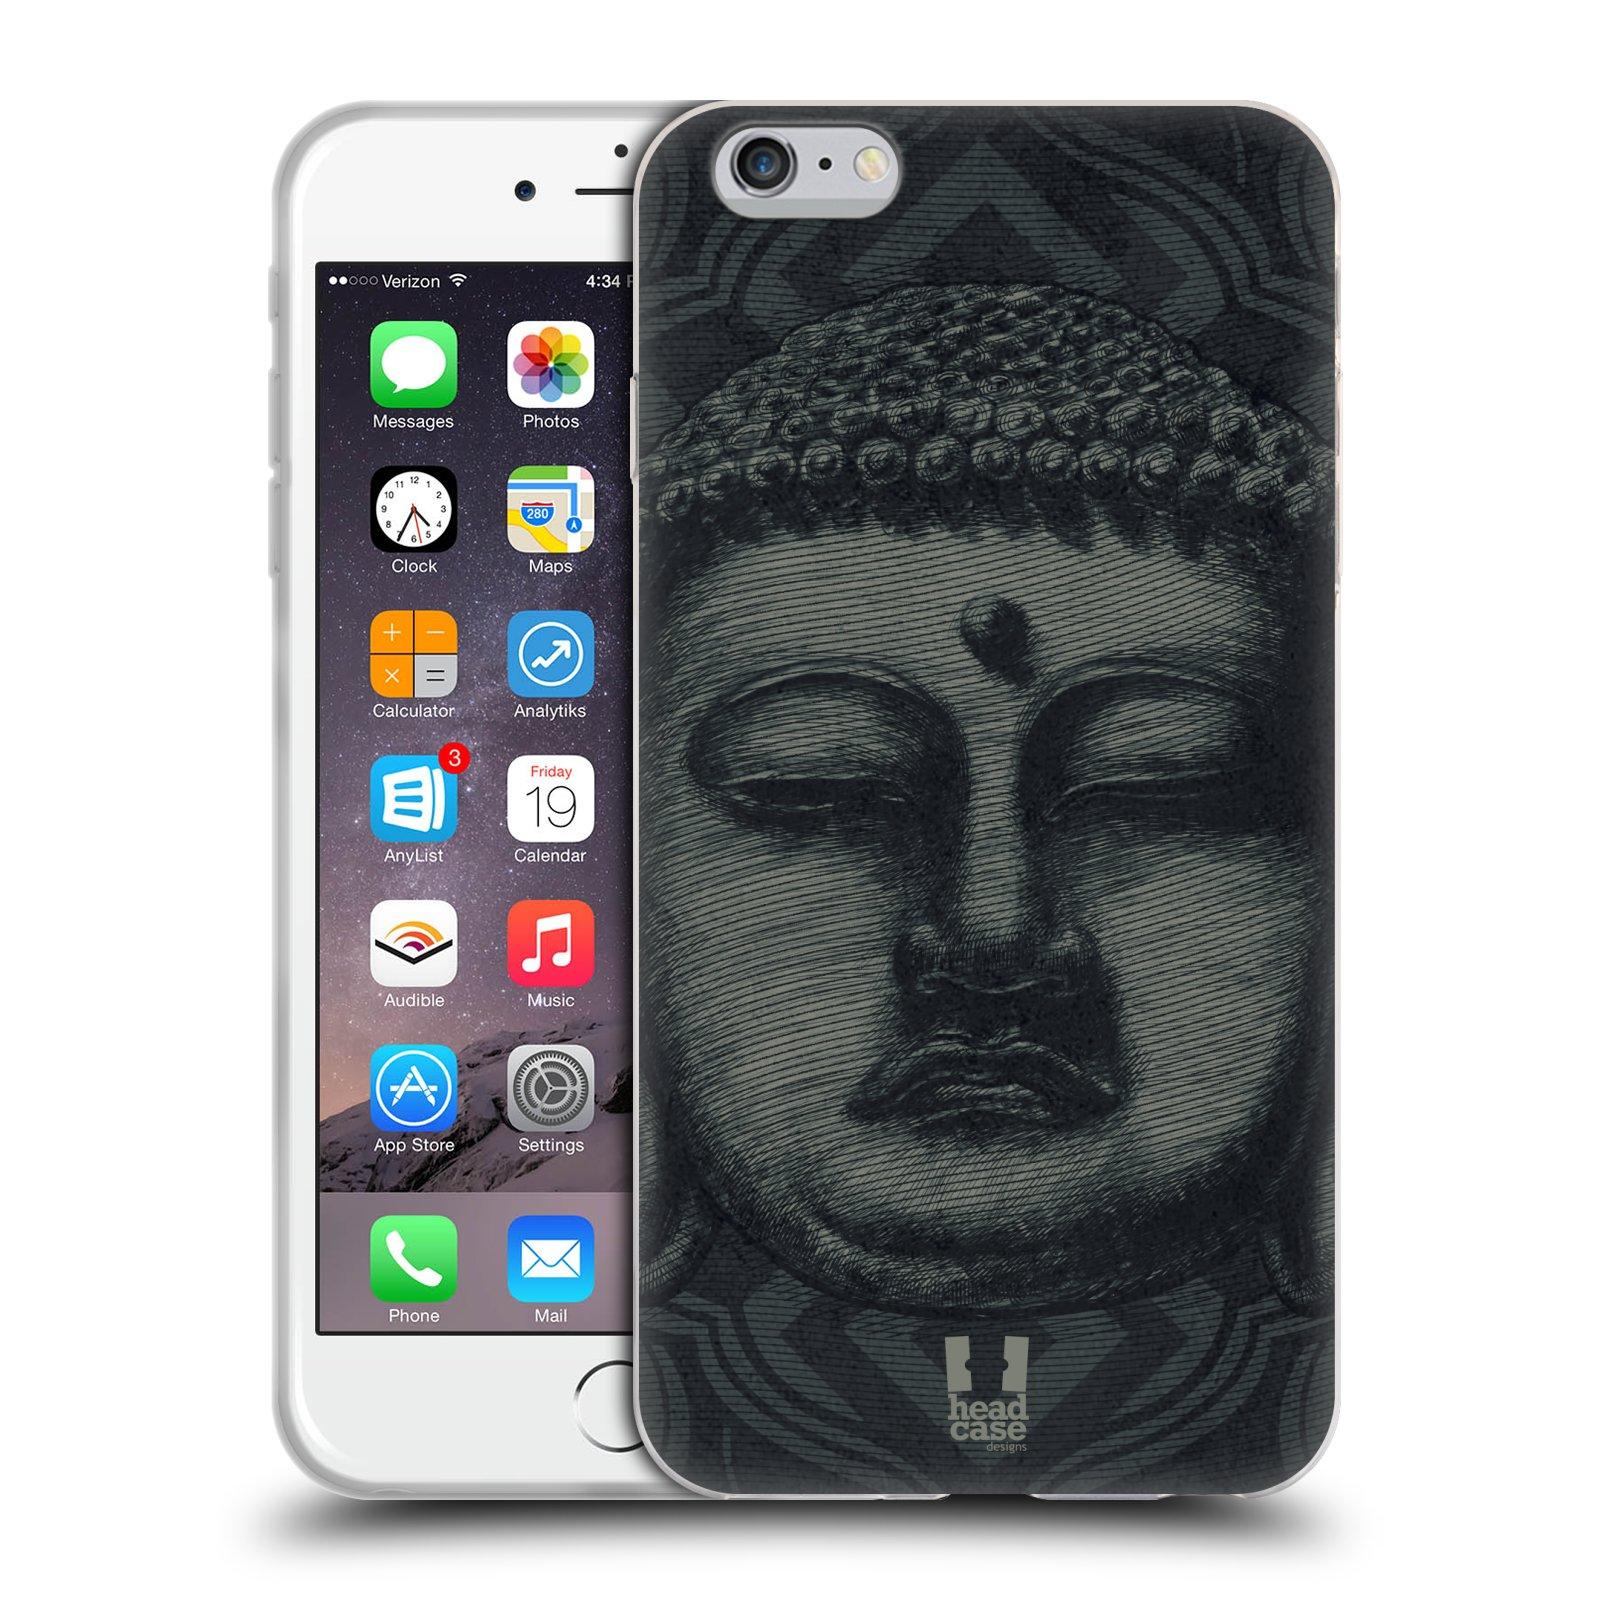 HEAD CASE silikonový obal na mobil Apple Iphone 6 PLUS/ 6S PLUS vzor BUDDHA KAMAKURA tvář